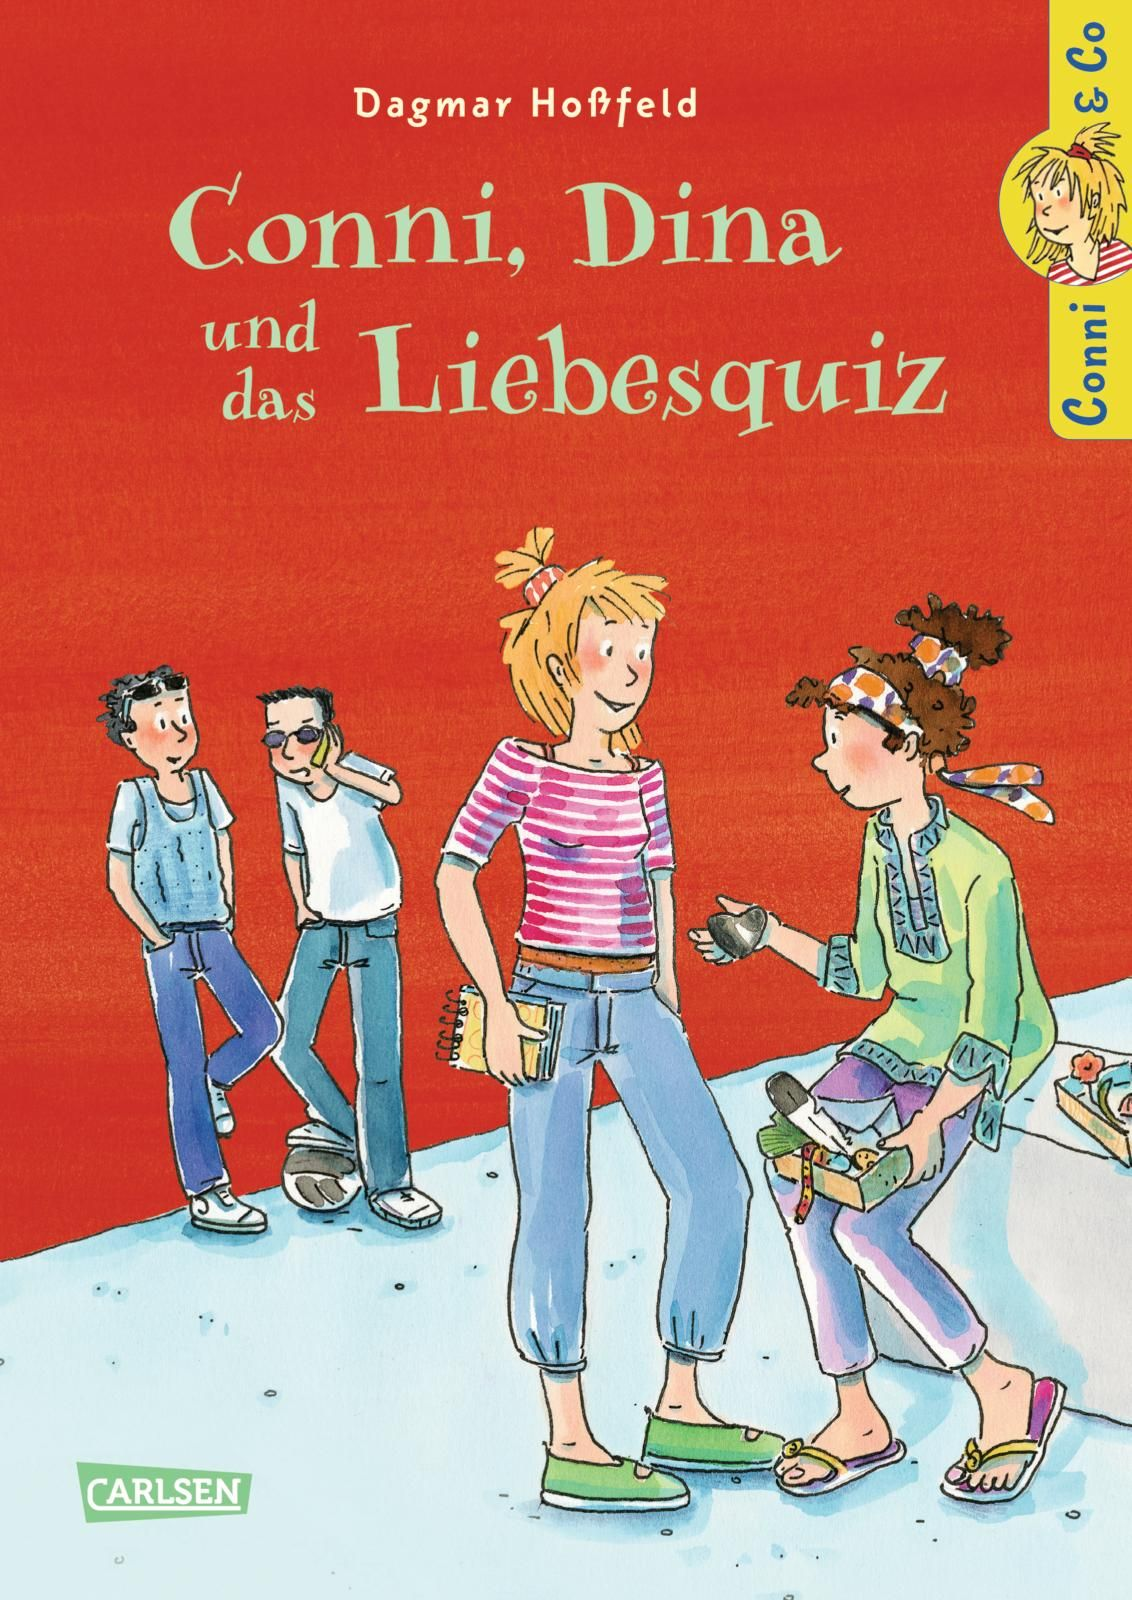 NEU-Conni-amp-Co-Conni-Dina-und-das-Liebesquiz-Dagmar-Hossfeld-554109